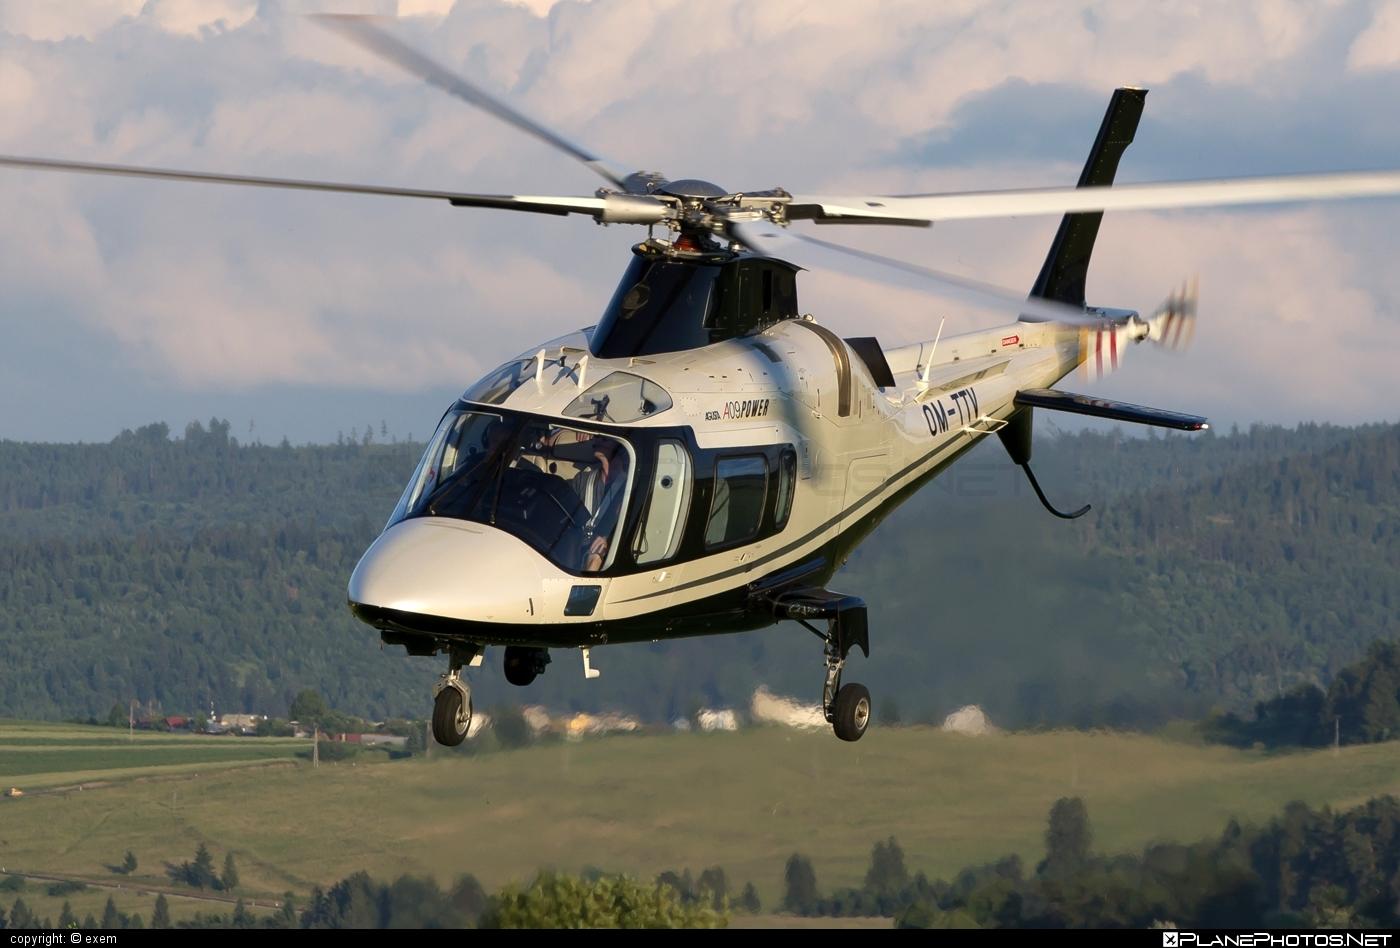 Agusta A109E Power - OM-TTV operated by Tatra Jet #a109 #a109e #a109power #agusta #agusta109 #agustaa109 #agustaa109e